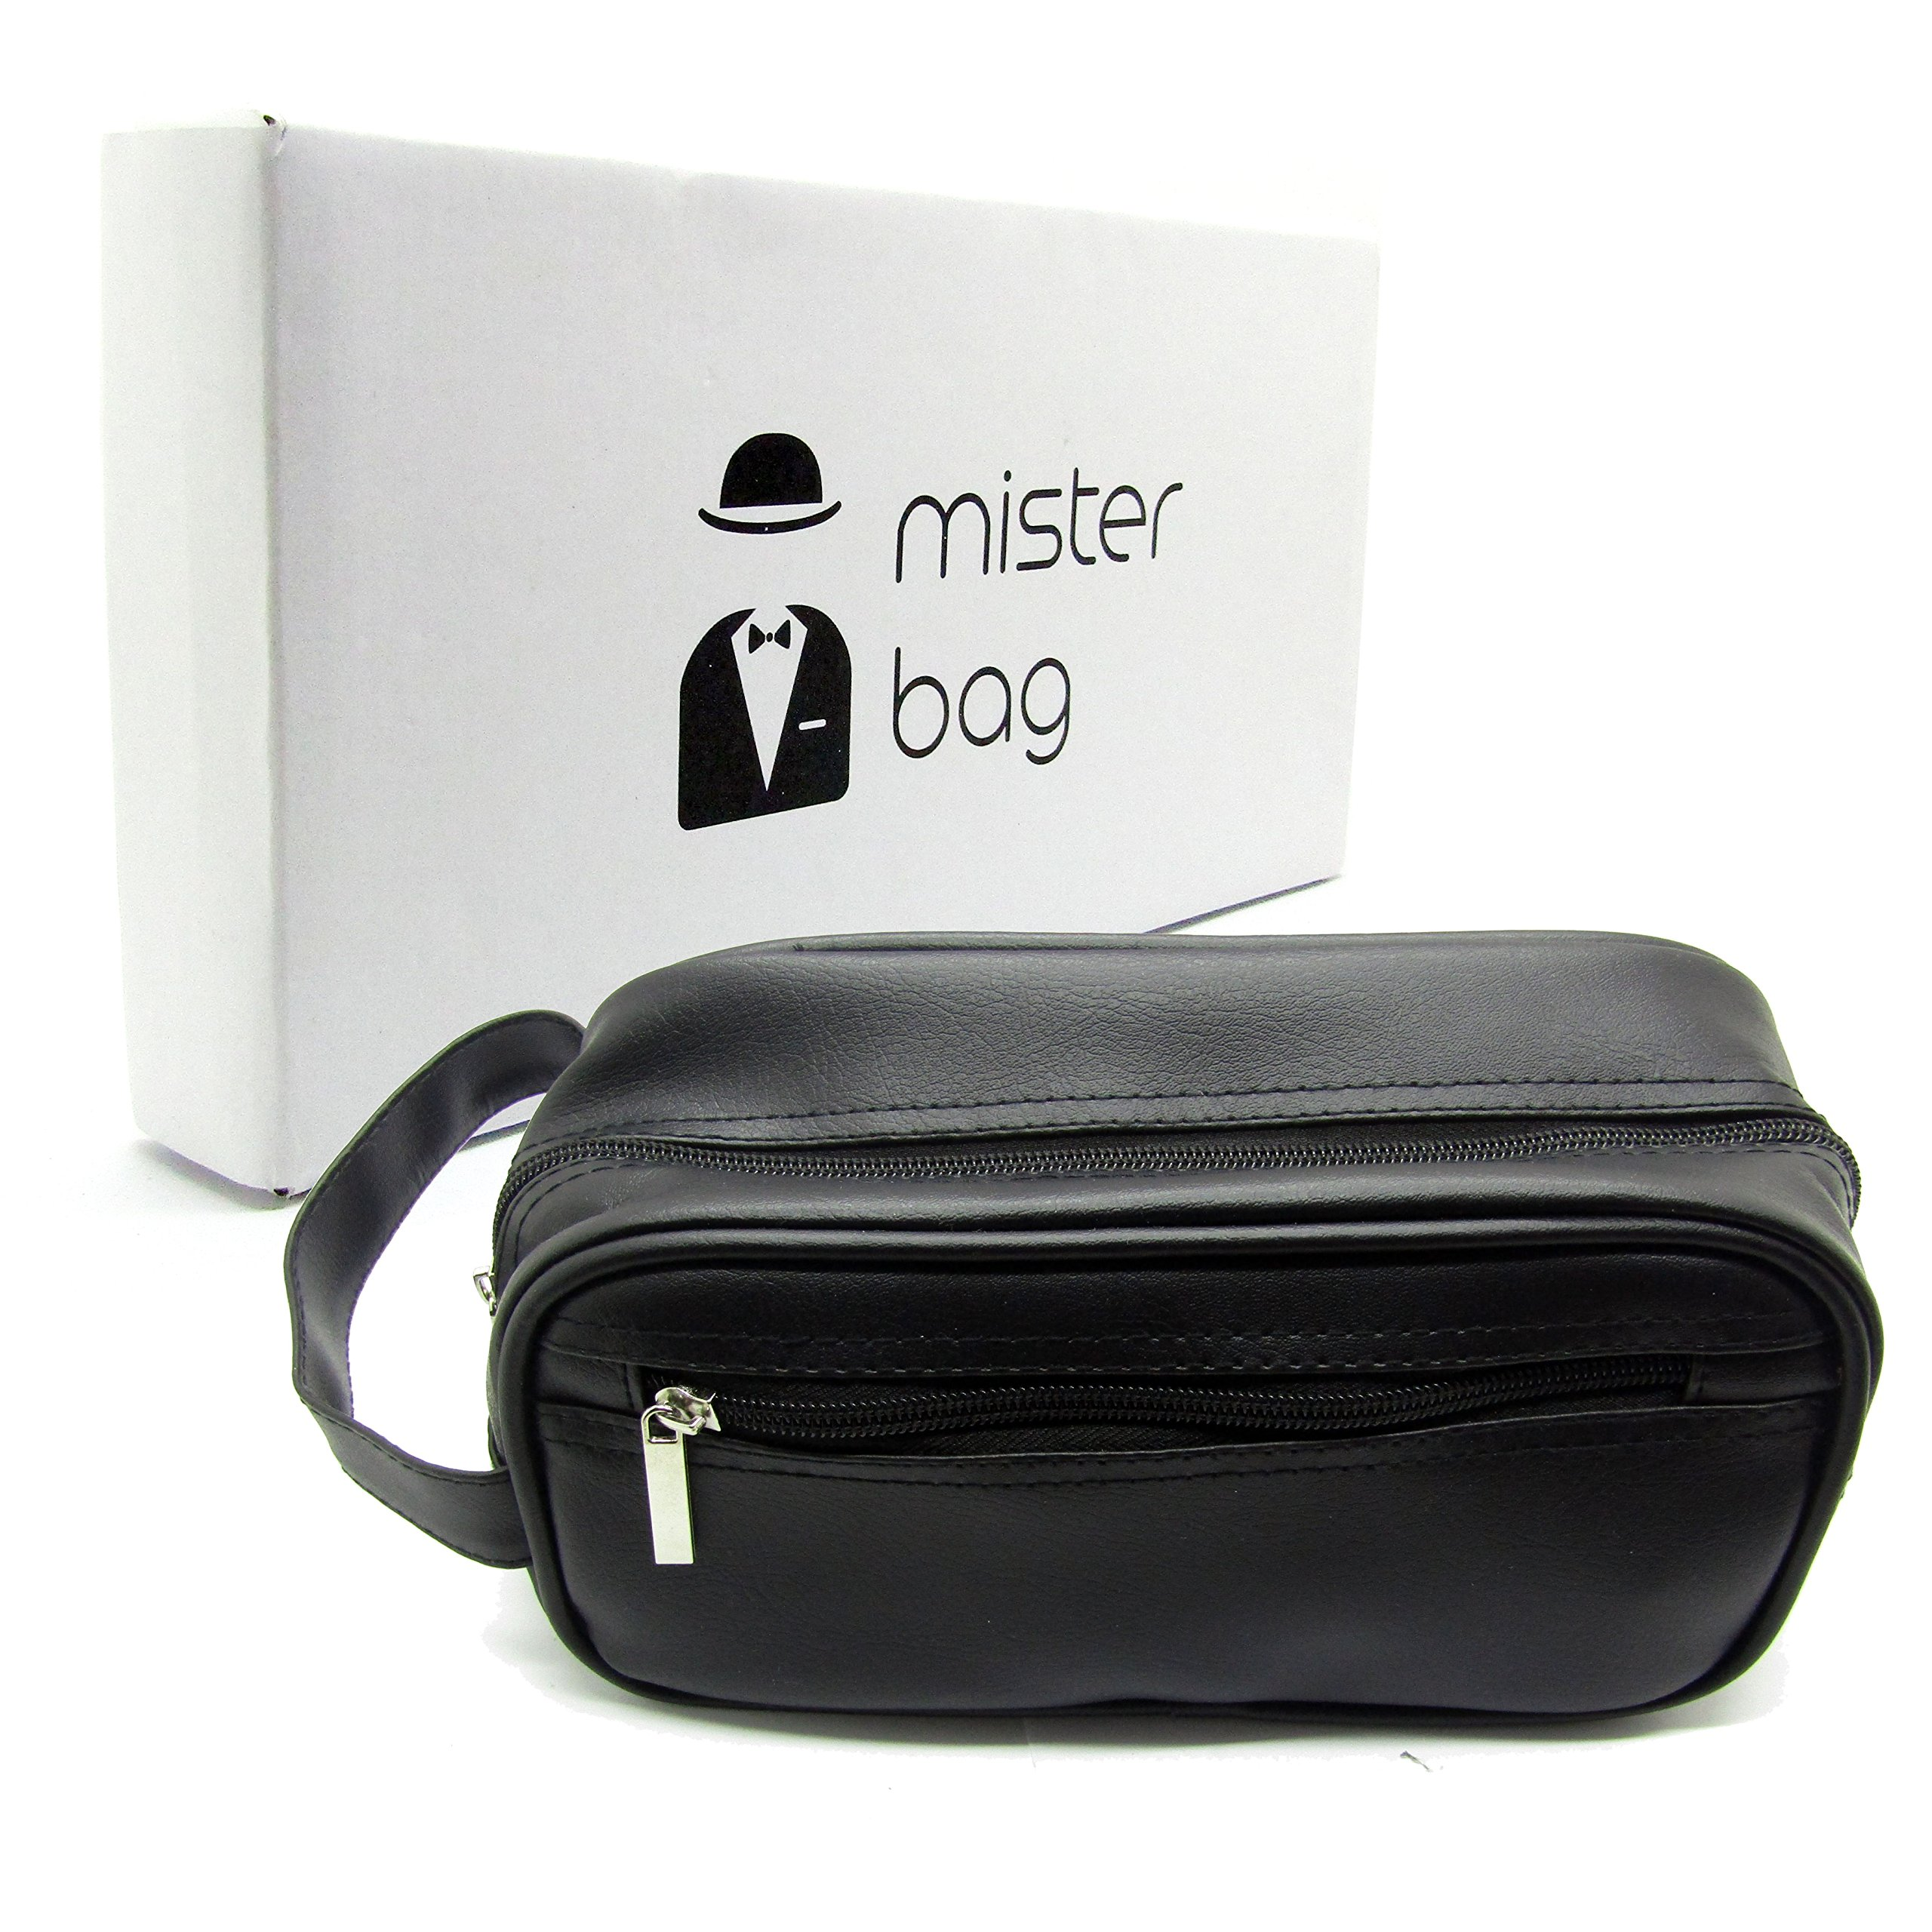 Mister Bag Leather Toiletry Bag Travel Toiletries Bag, Black